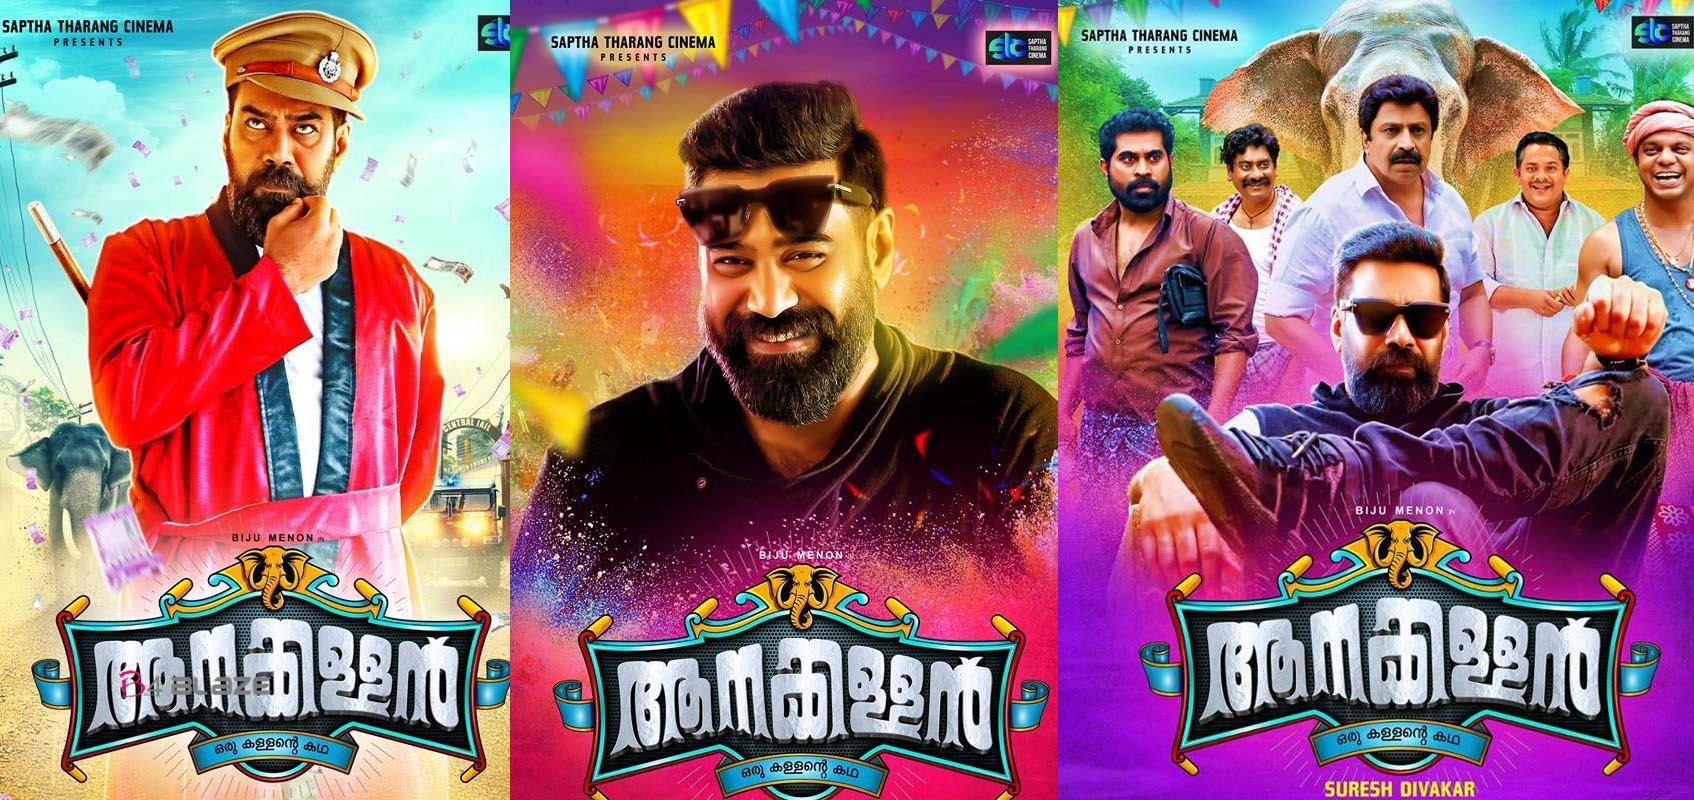 Aanakallan Malayalam Movie Songs